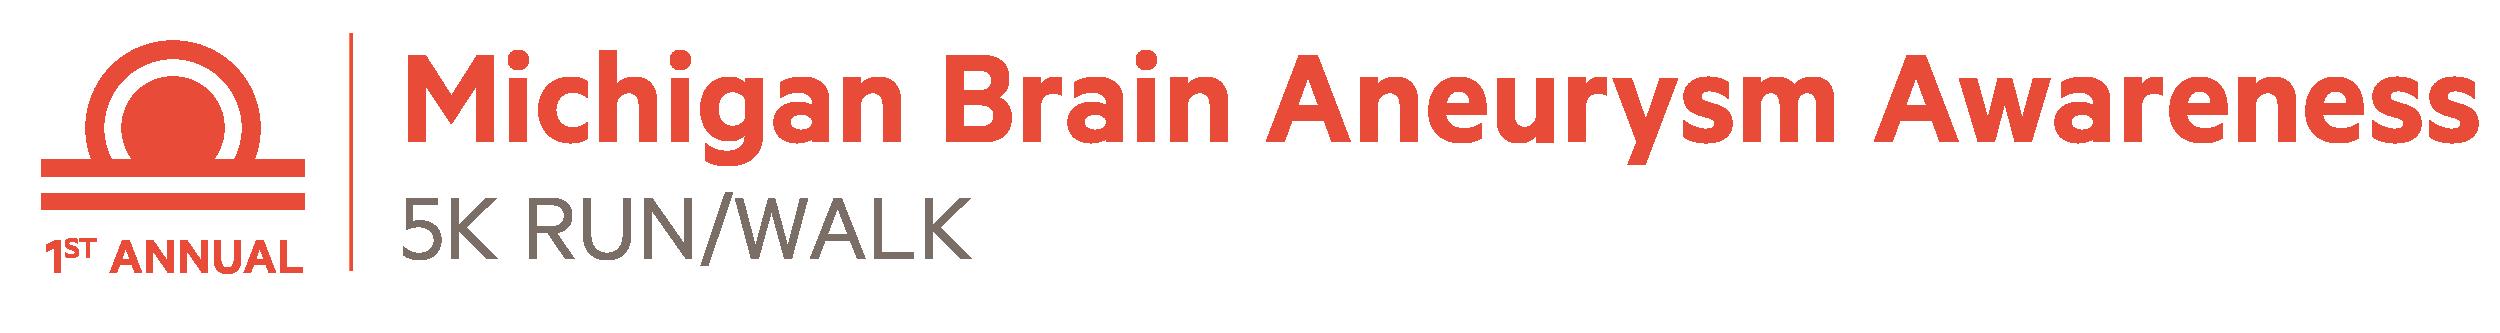 1st Annual Michigan Brain Aneurysm 5K Run/Walk, Clare, MI @ Clare High School   Clare   Michigan   United States